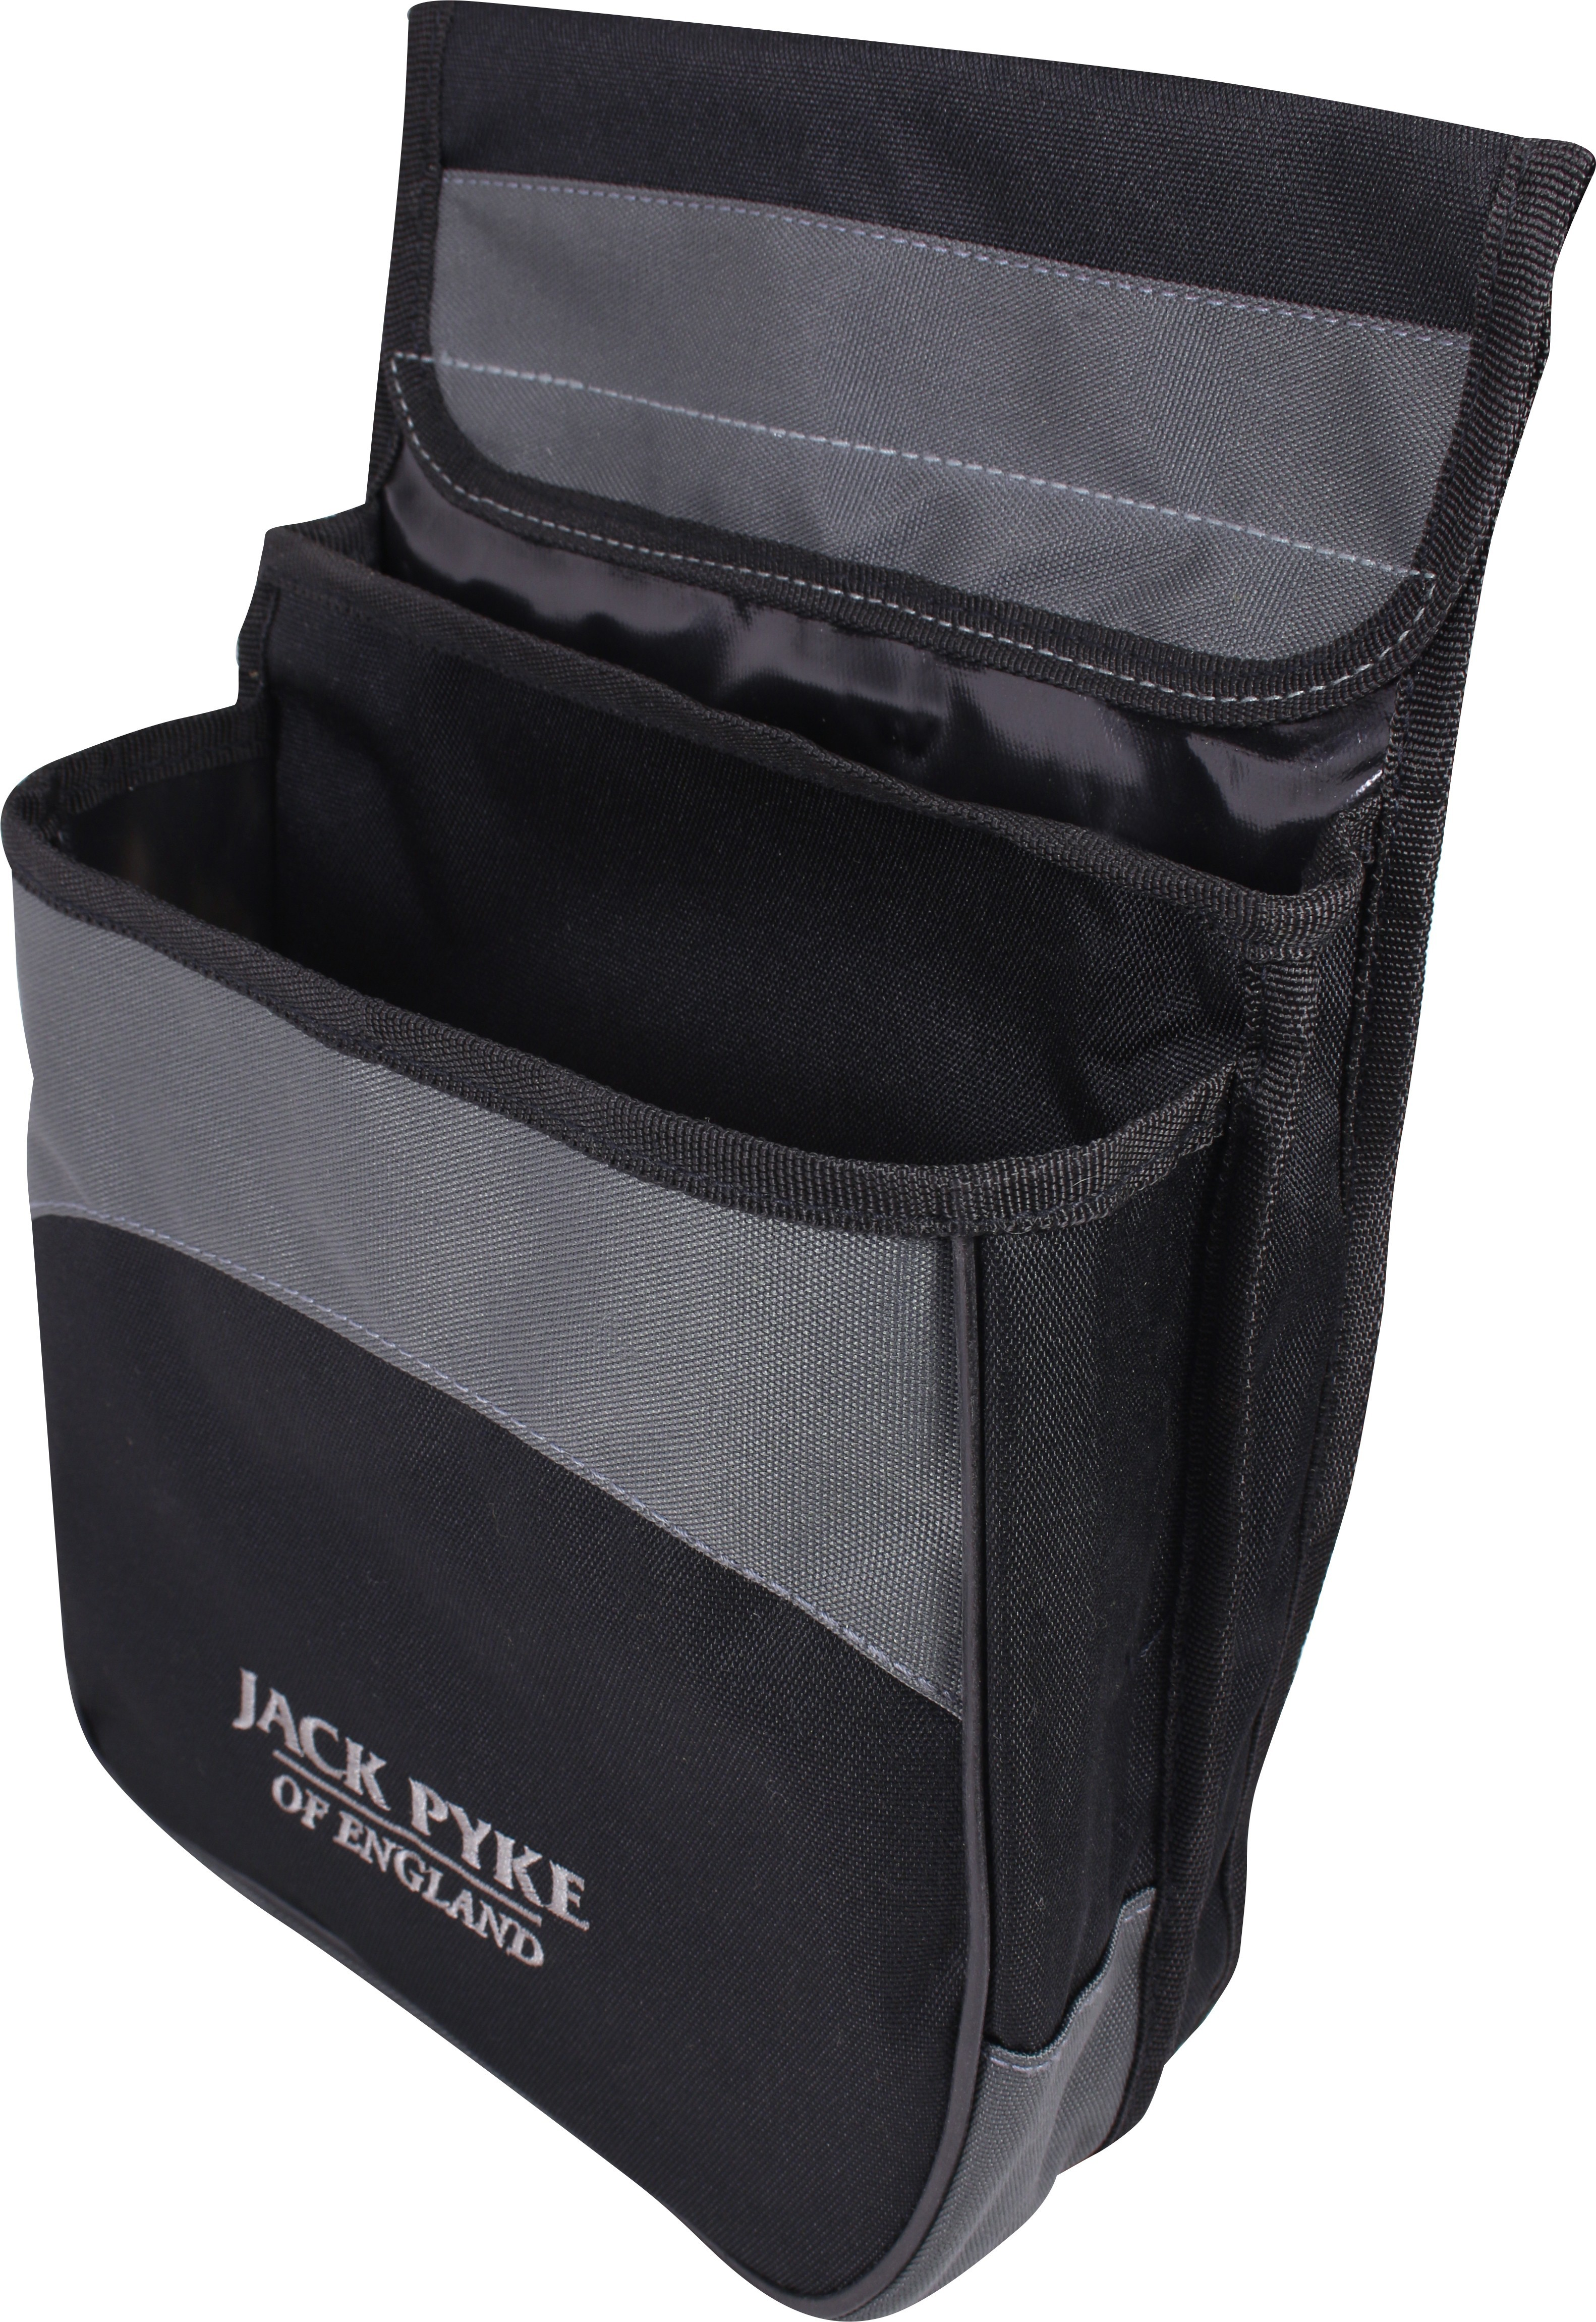 Jack Pyke Sporting Range The Black   Grey Cartridge Pouch